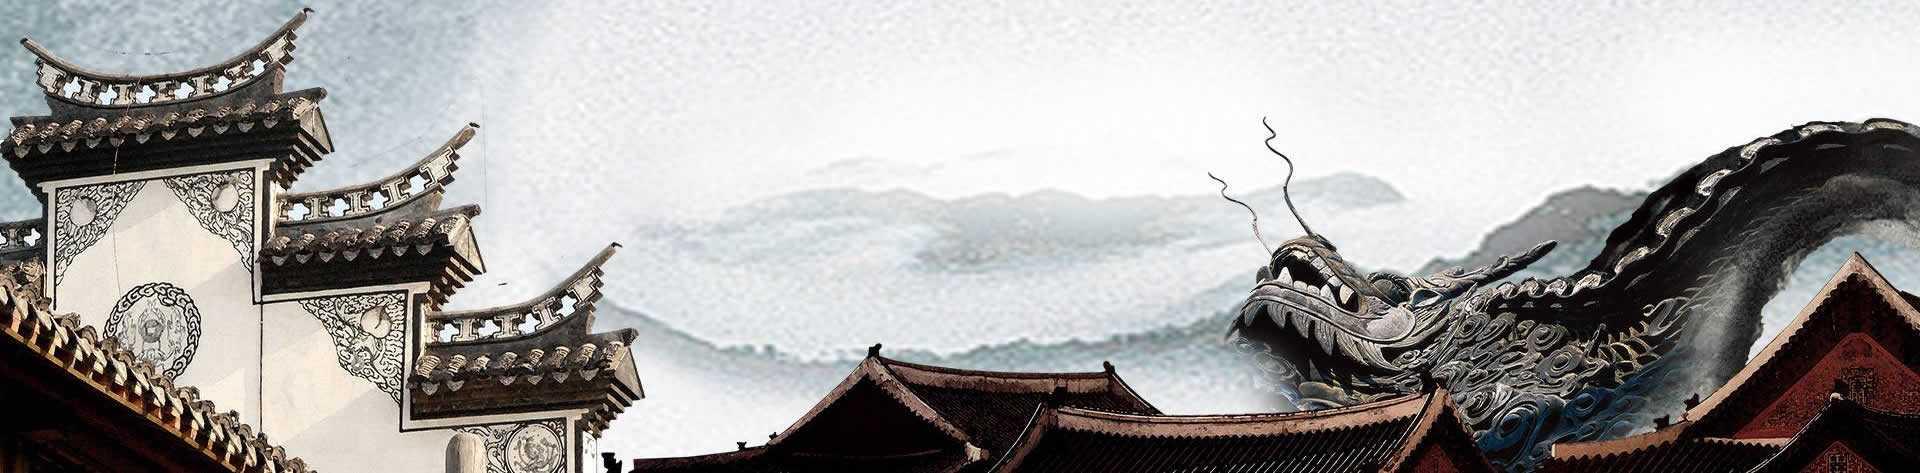 THE FREE SKY - 天墉城 - 桃源村